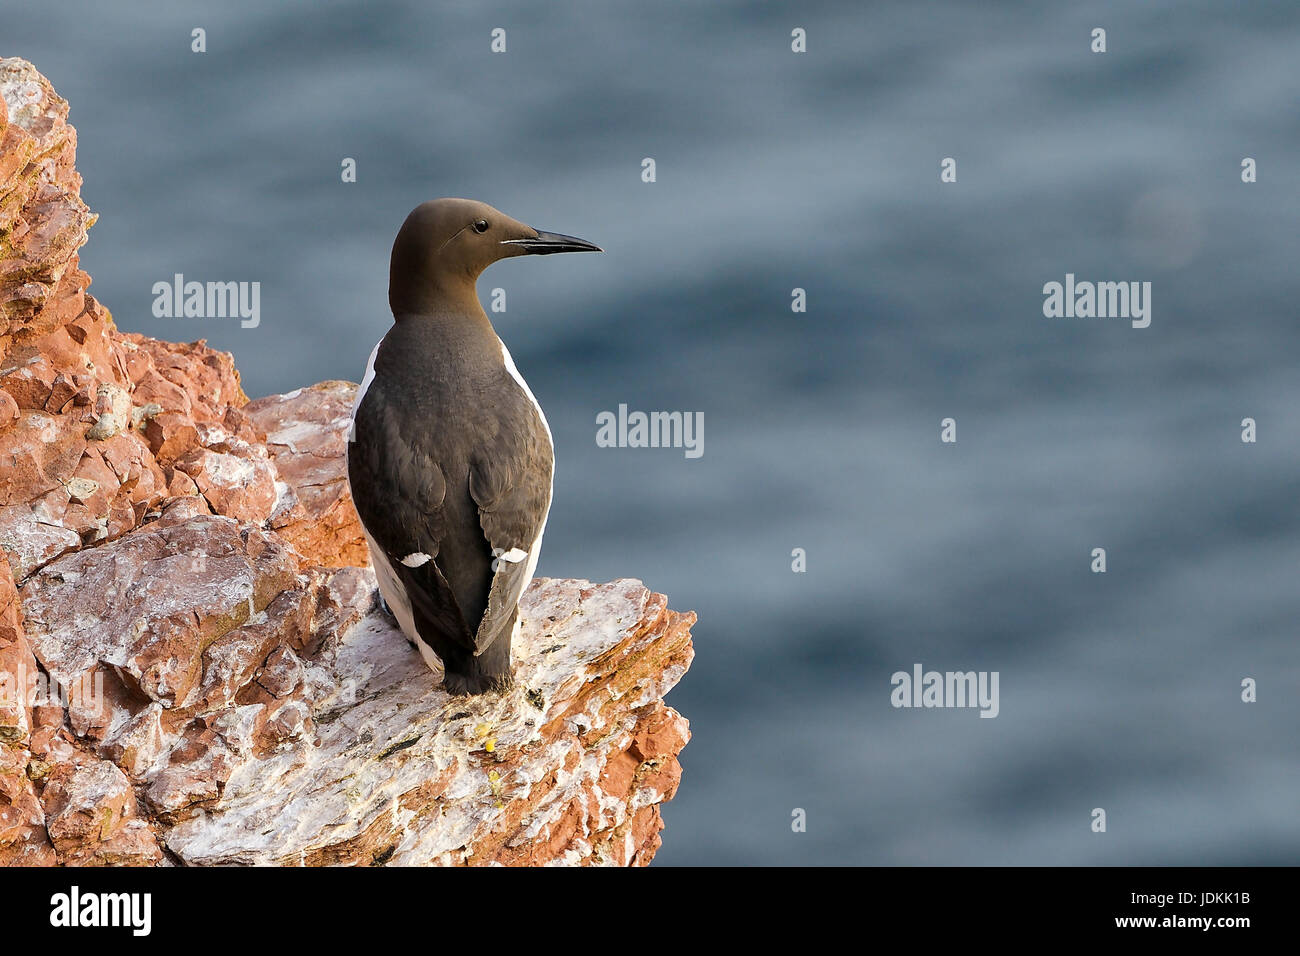 Trottellumme / Uria aalge / Common Guillemot - Stock Image